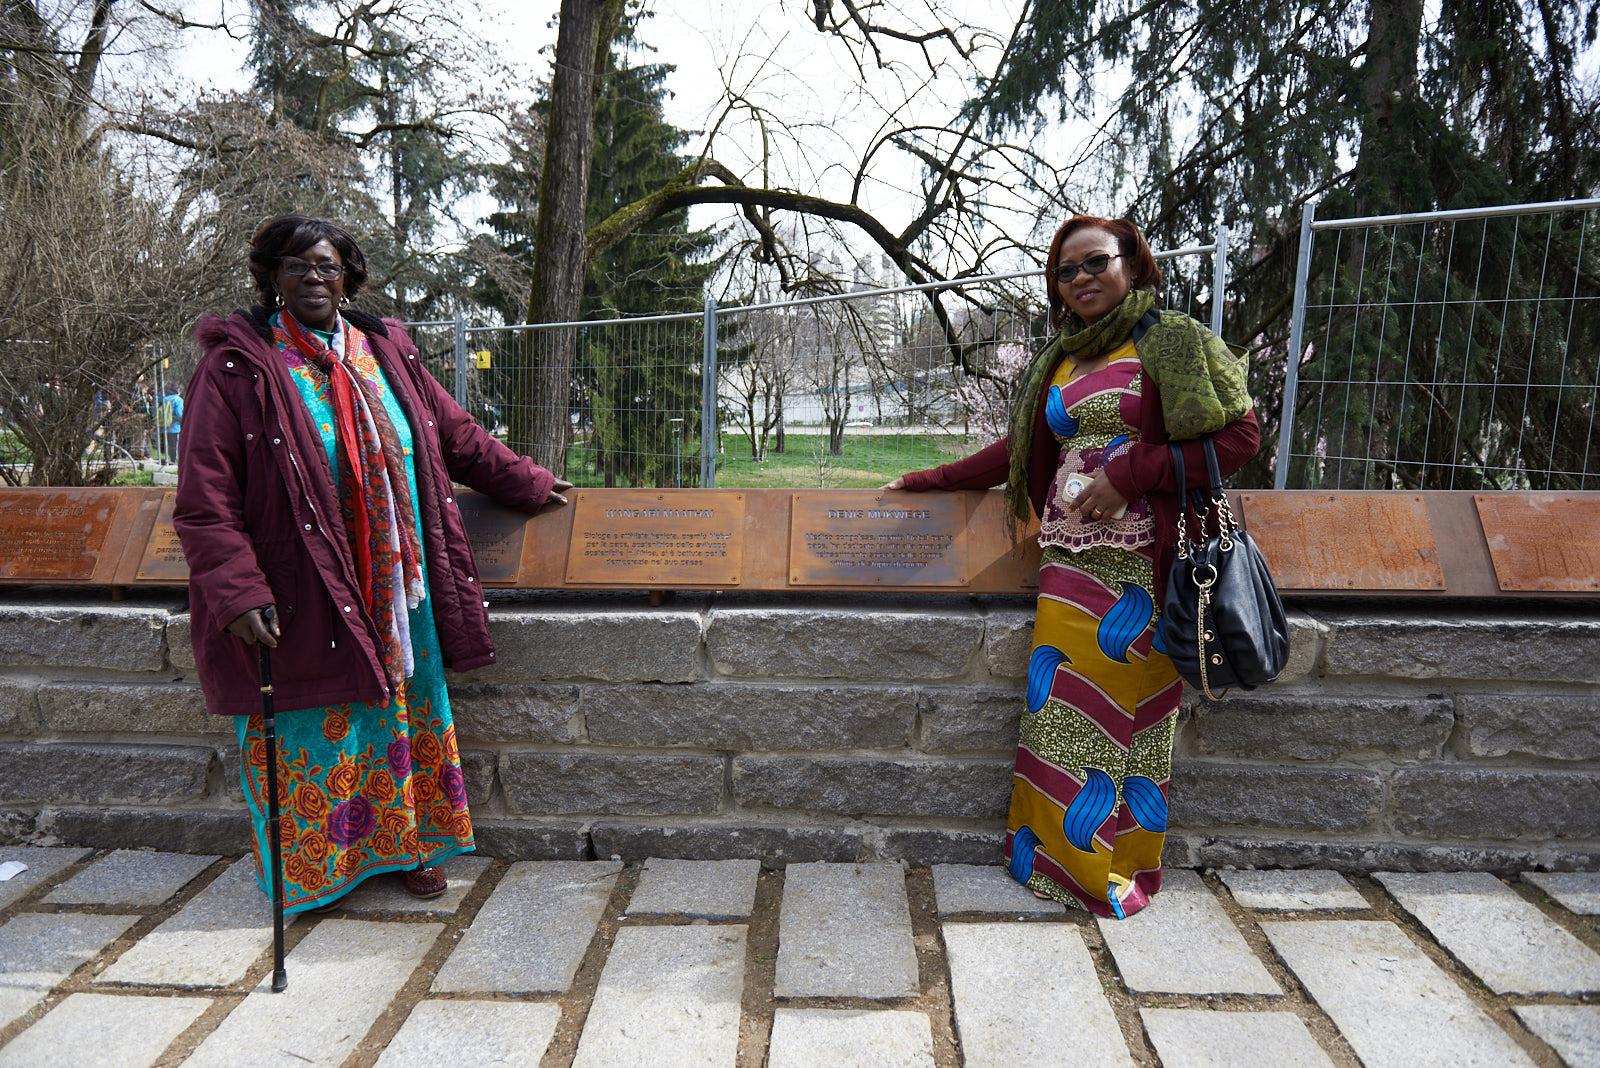 Mwatha con la targa per Maathai